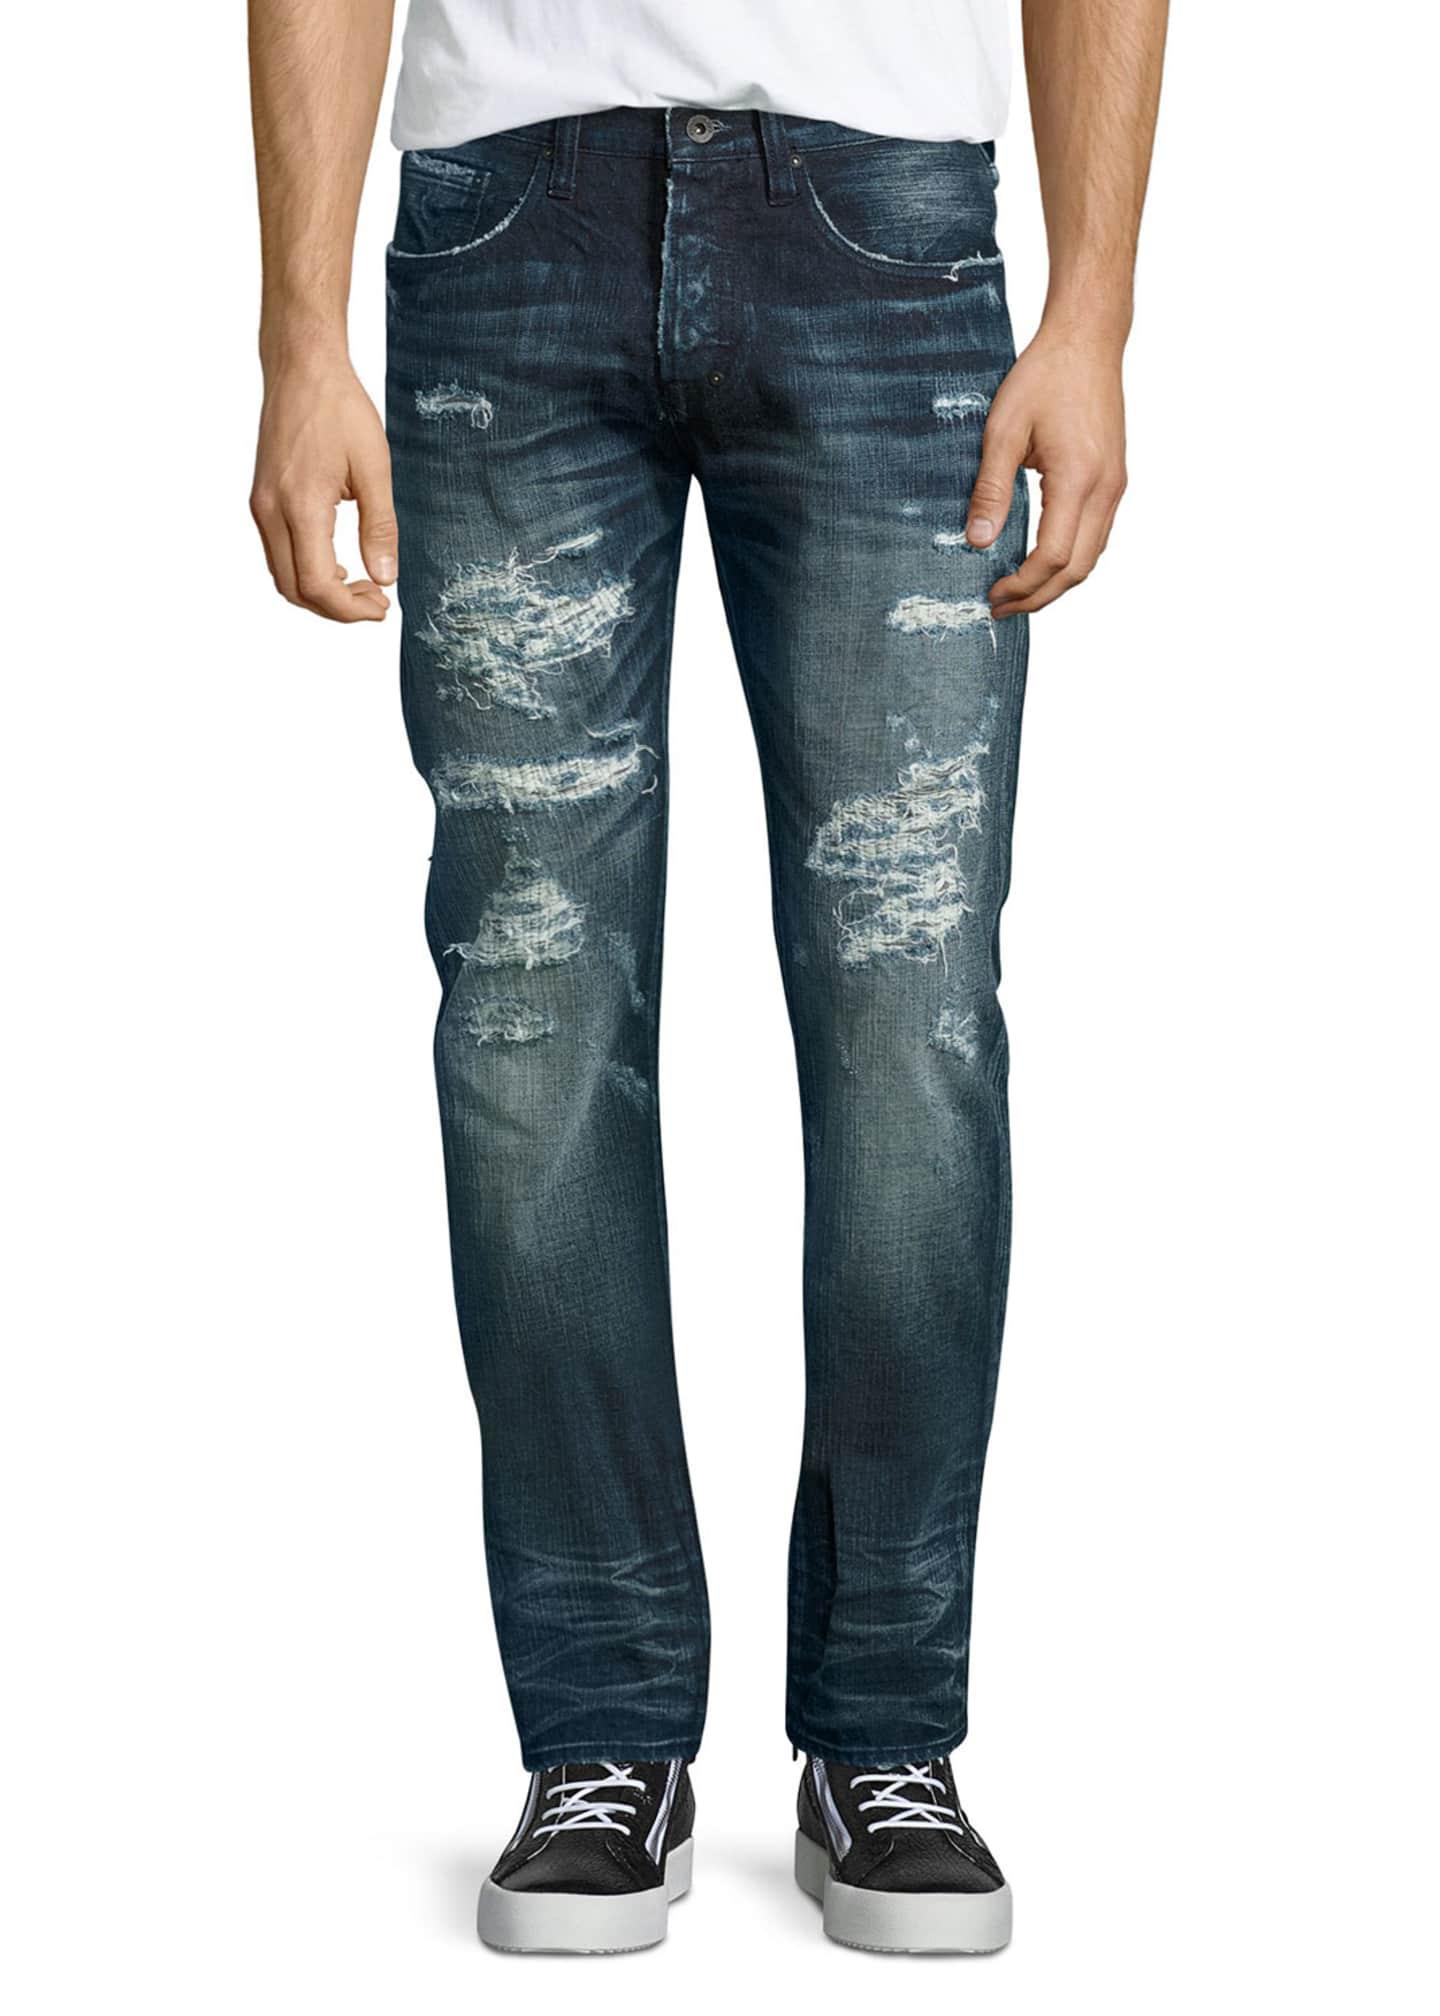 PRPS Demon Distressed Technics Denim Jeans, Dark Indigo